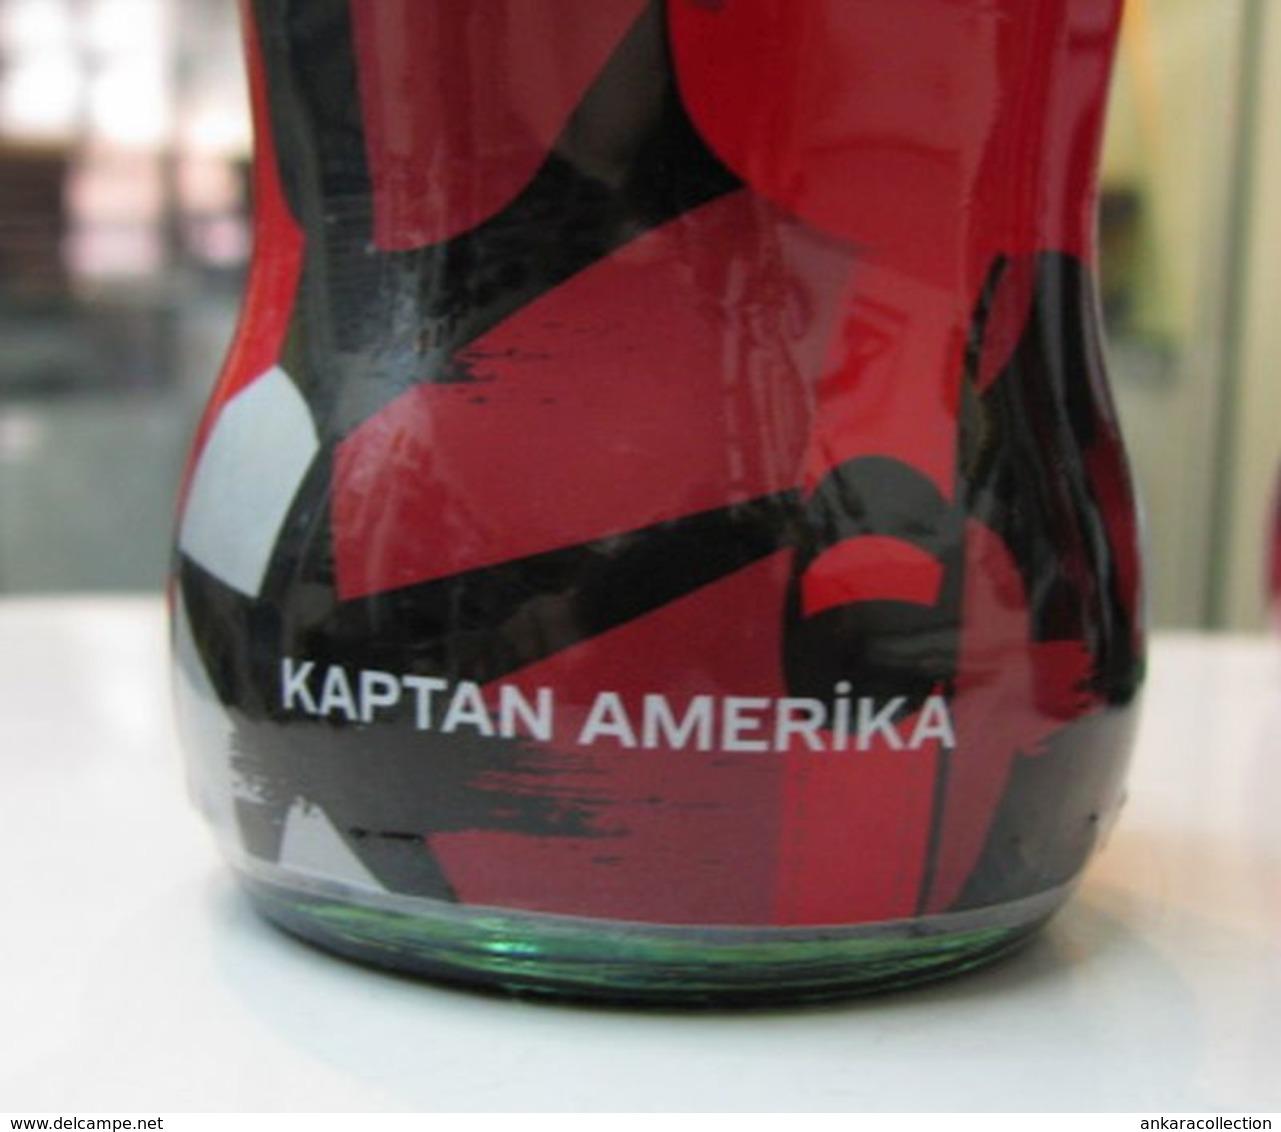 AC - COCA COLA MARVEL AVENGERS 2018 CAPTAIN AMERICA - KAPTAN AMERIKA SHRINK WRAPPED EMPTY GLASS BOTTLE & CROWN CAP - Botellas